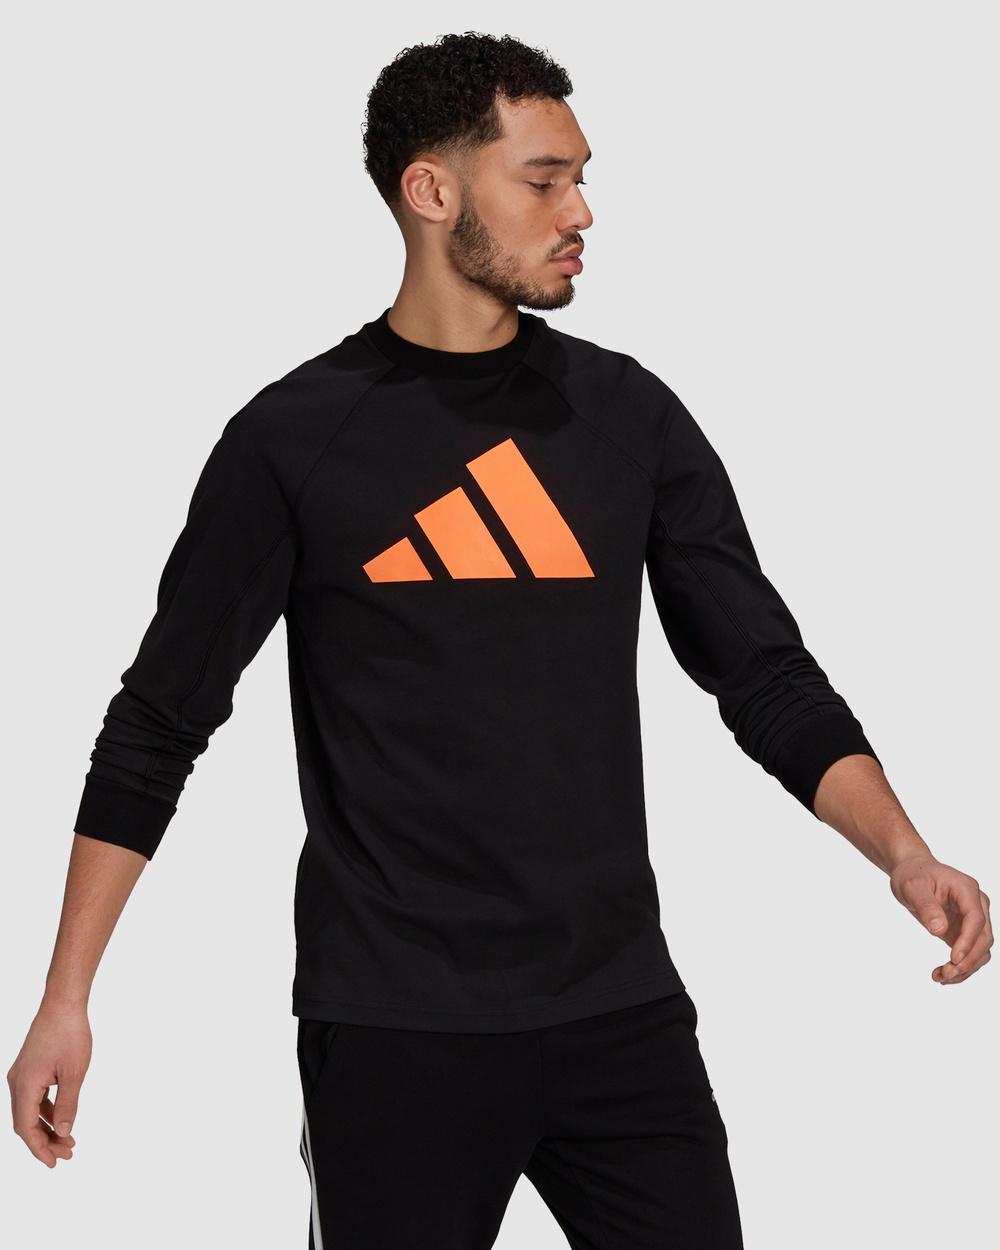 adidas Performance Sportswear Lightweight Sweatshirt Jumpers & Cardigans Black